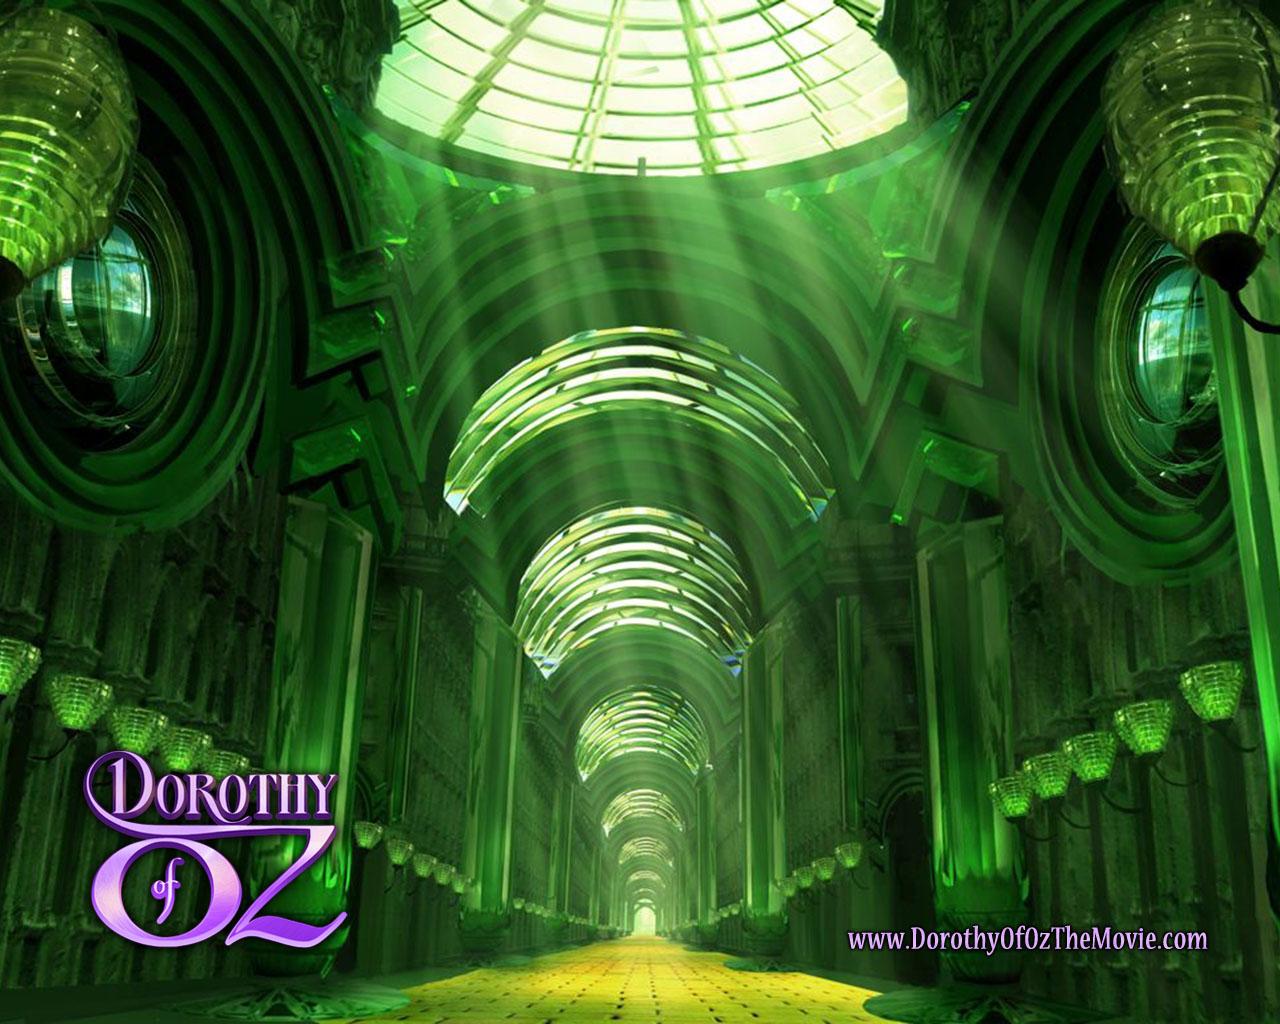 http://st-im.kinopoisk.ru/im/wallpaper/1/5/3/kinopoisk.ru-Legends-of-Oz_3A-Dorothy_27s-Return-1533896--w--1280.jpg